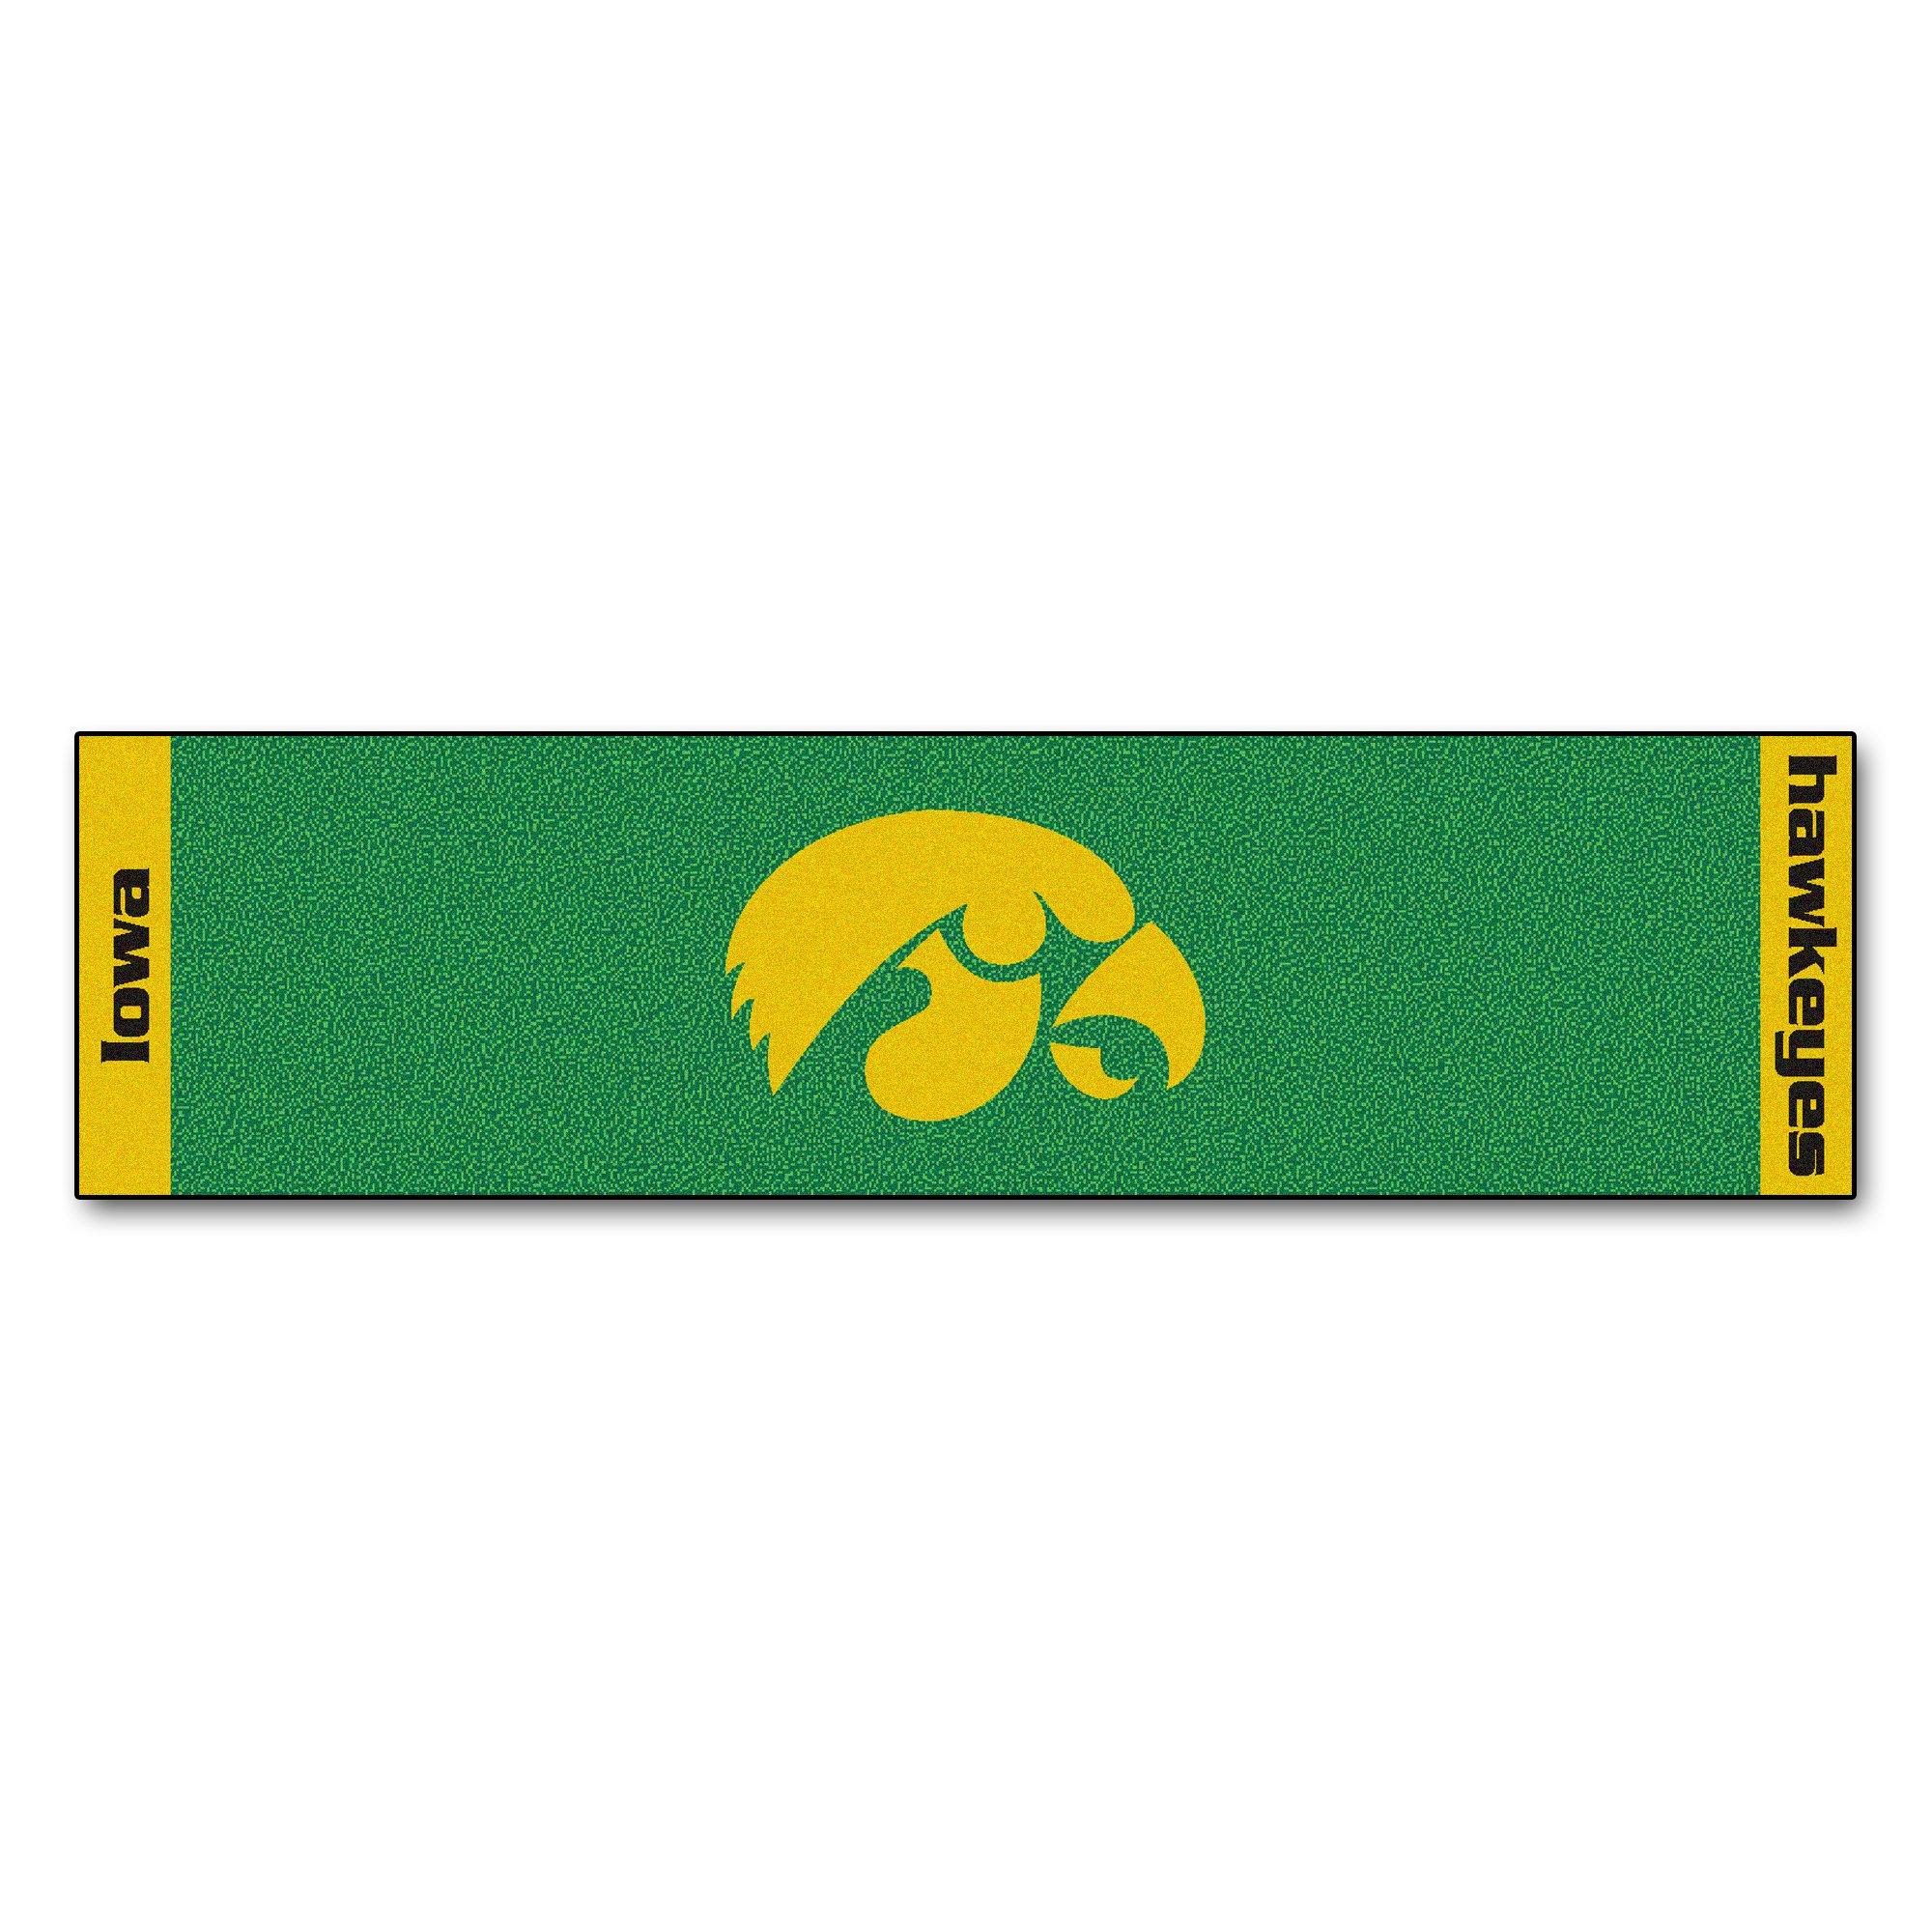 NCAA University of Iowa Hawkeyes Putting Green Mat Golf Accessory